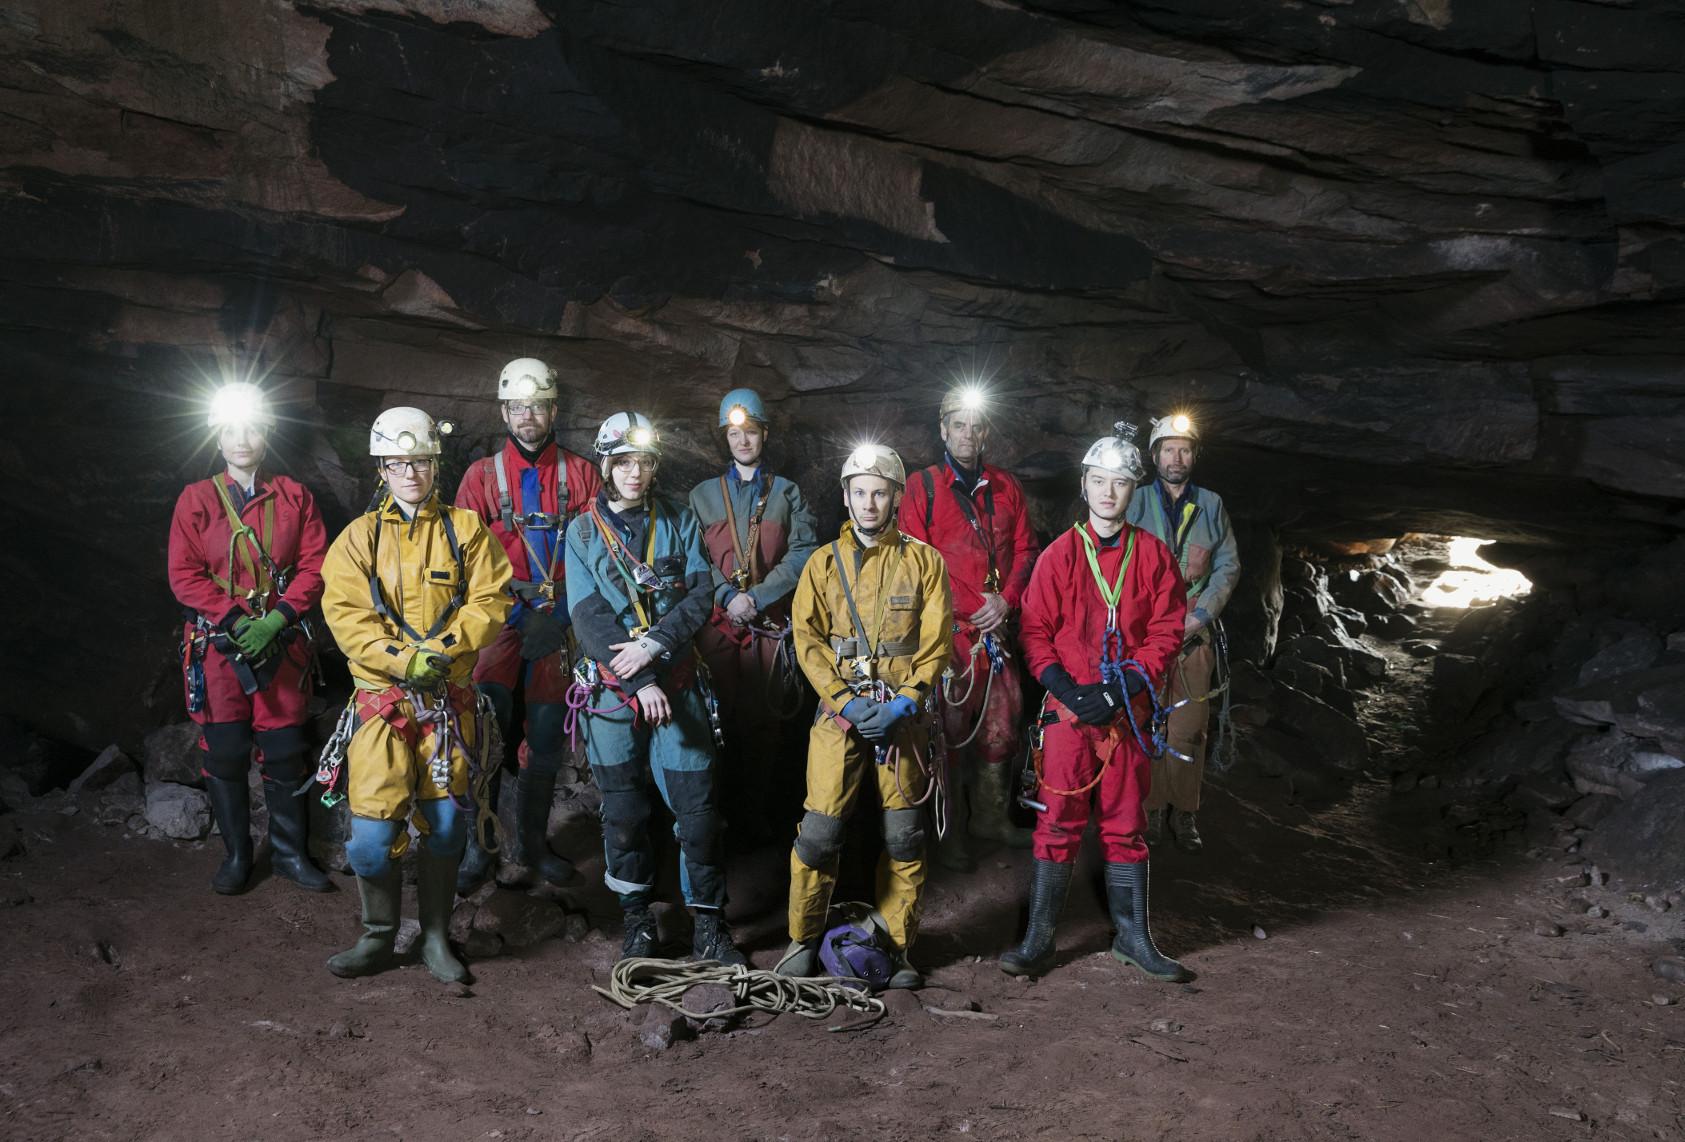 BBC Oneness, Cavers, Wemyss, Photographer: Martin Parr